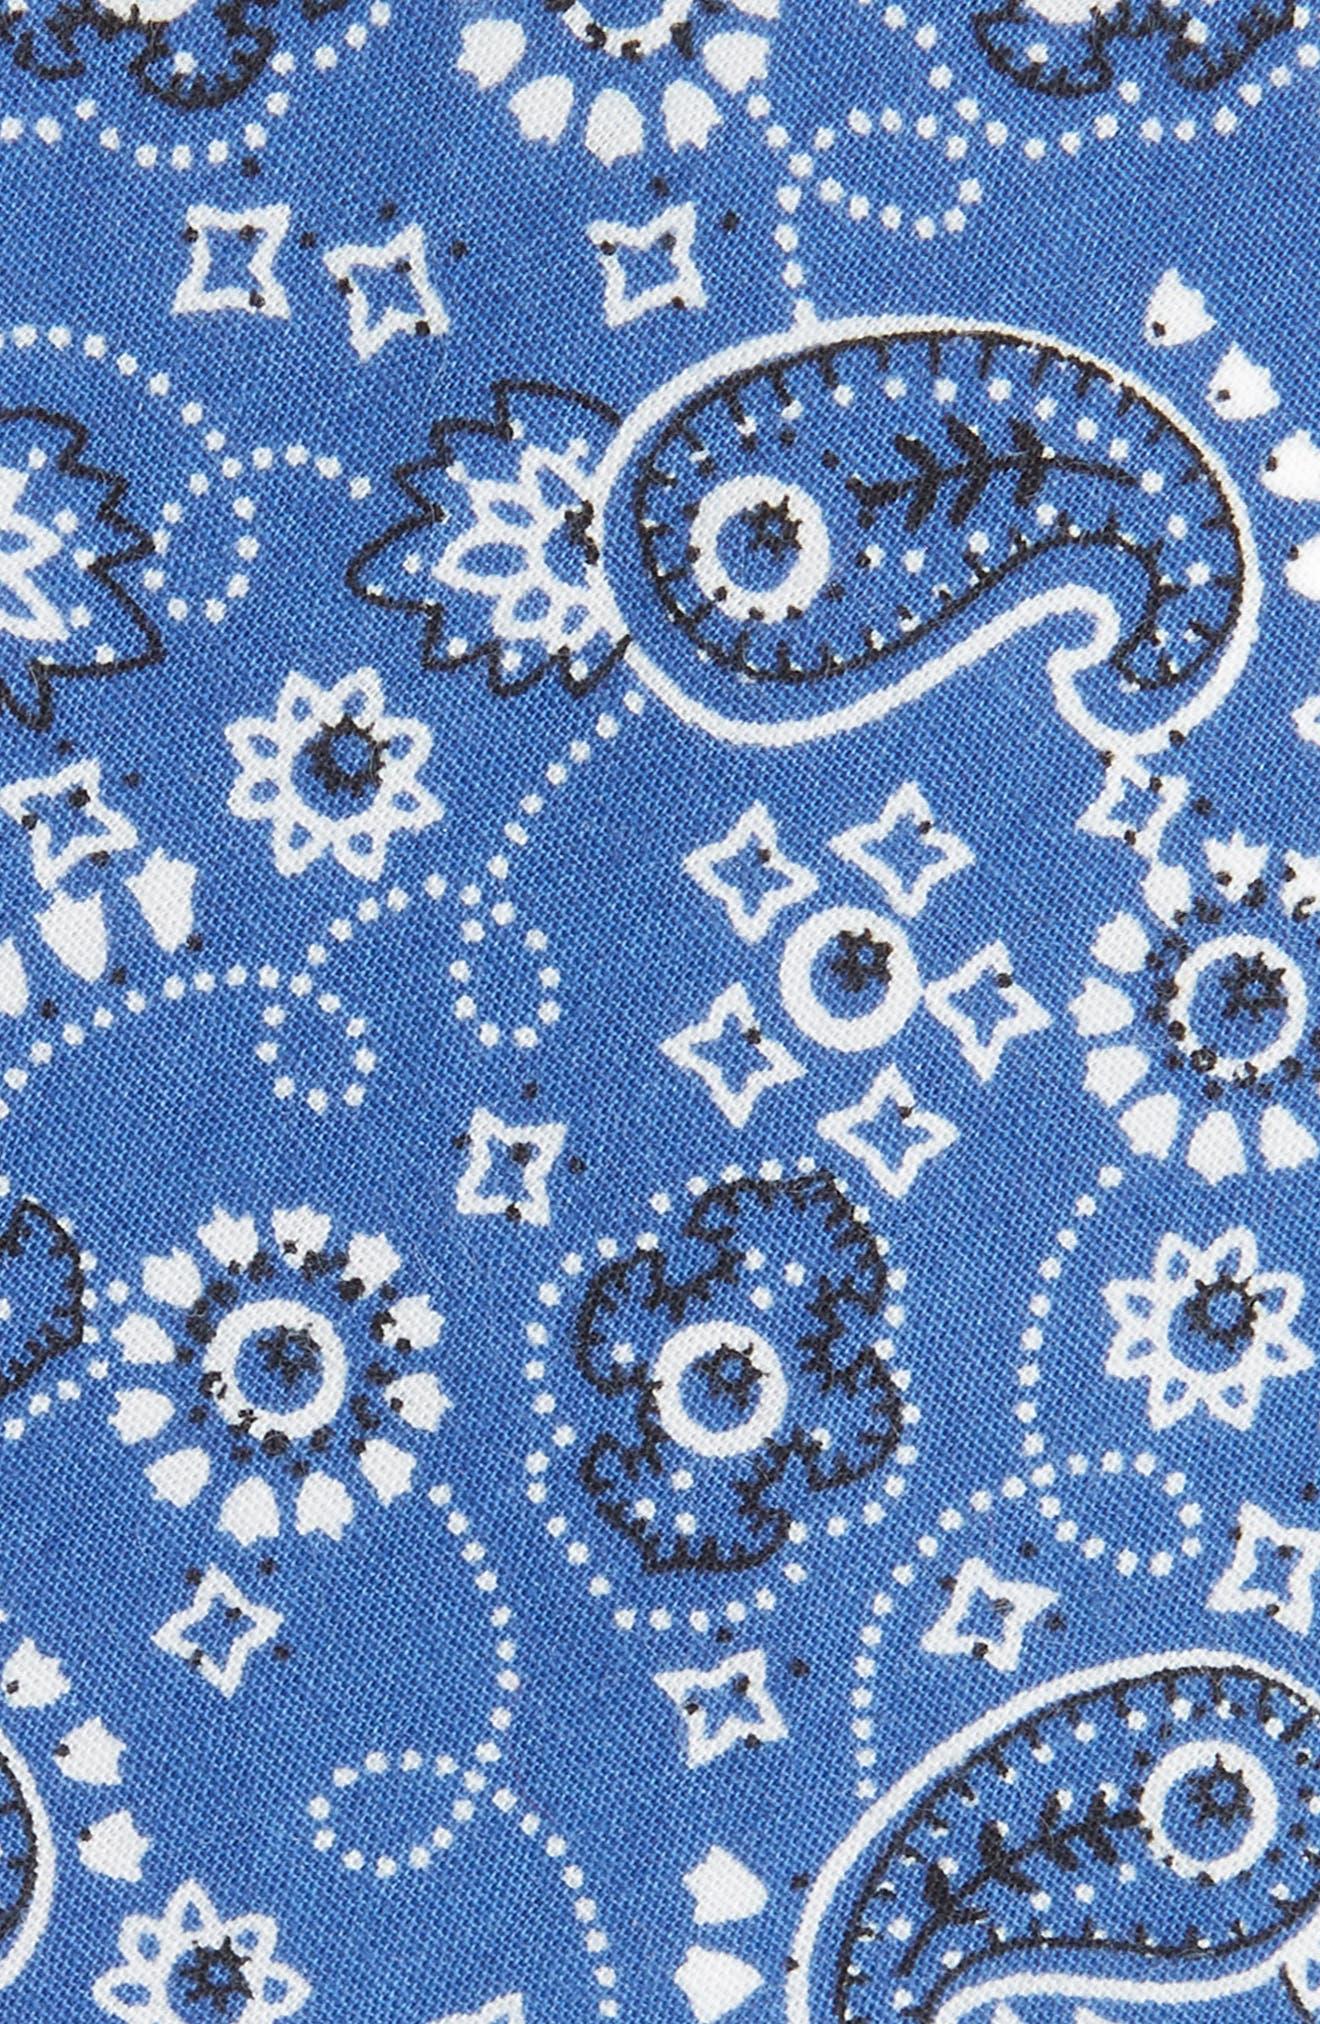 Orduna Paisley Cotton Tie,                             Alternate thumbnail 2, color,                             NAVY